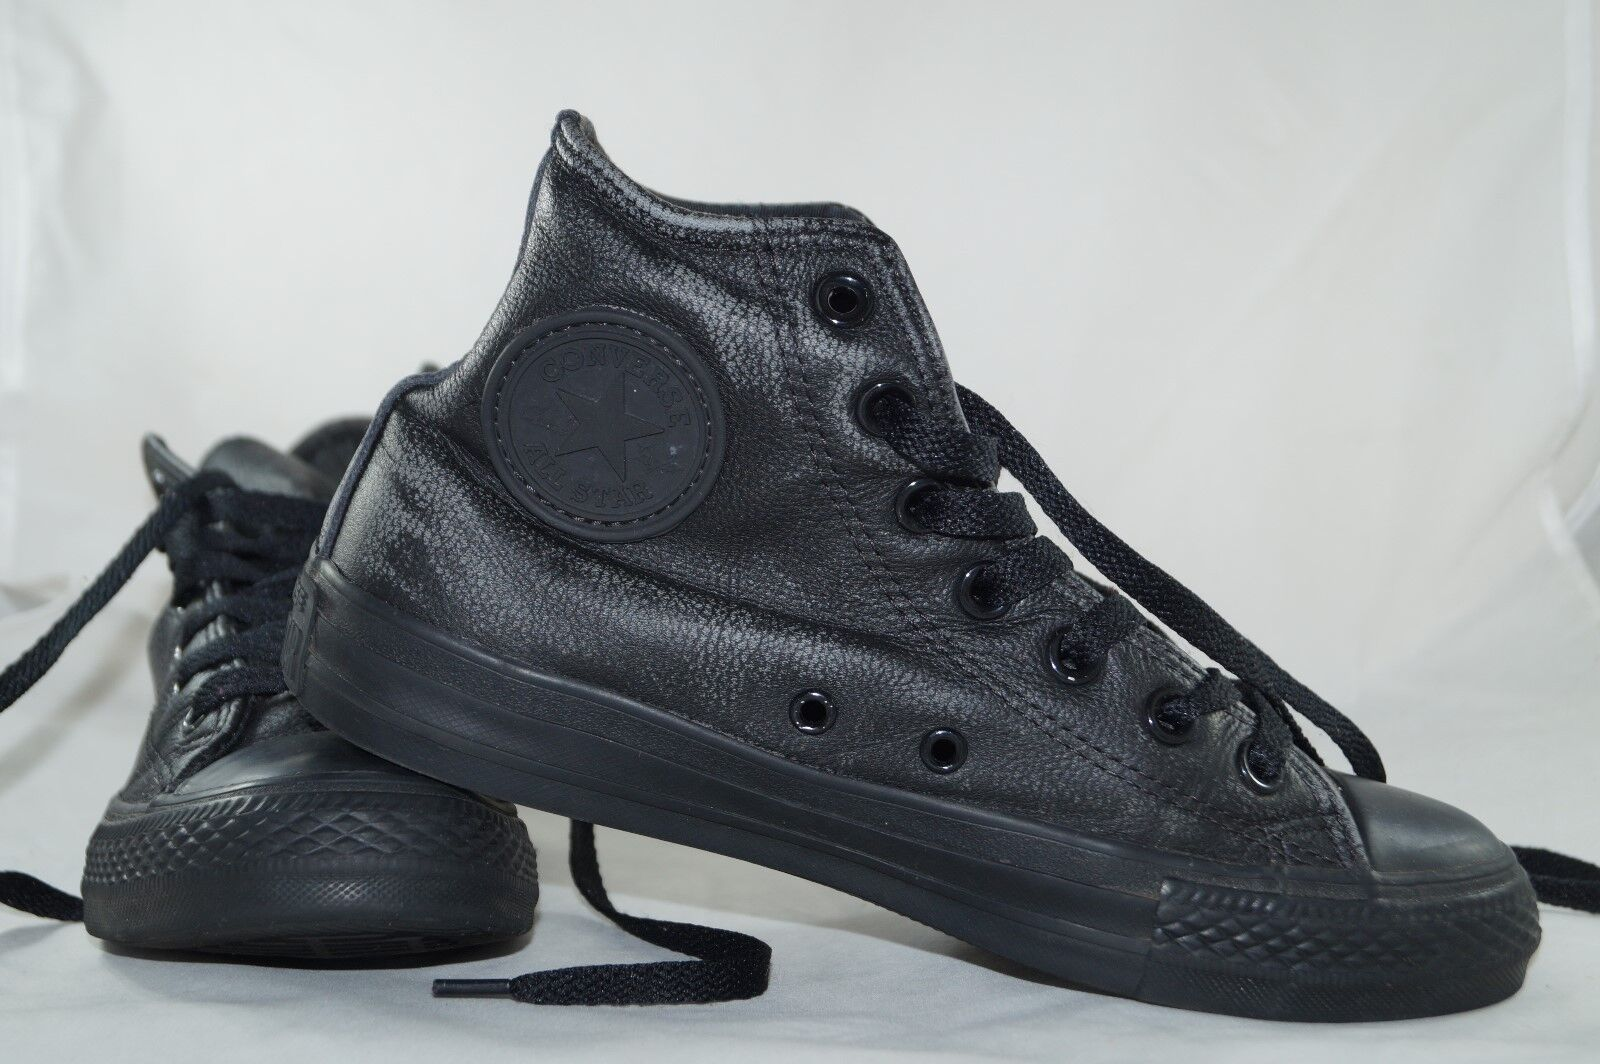 Converse Chucks All Star High Tops Gr: 37,5 Leather Schwarz